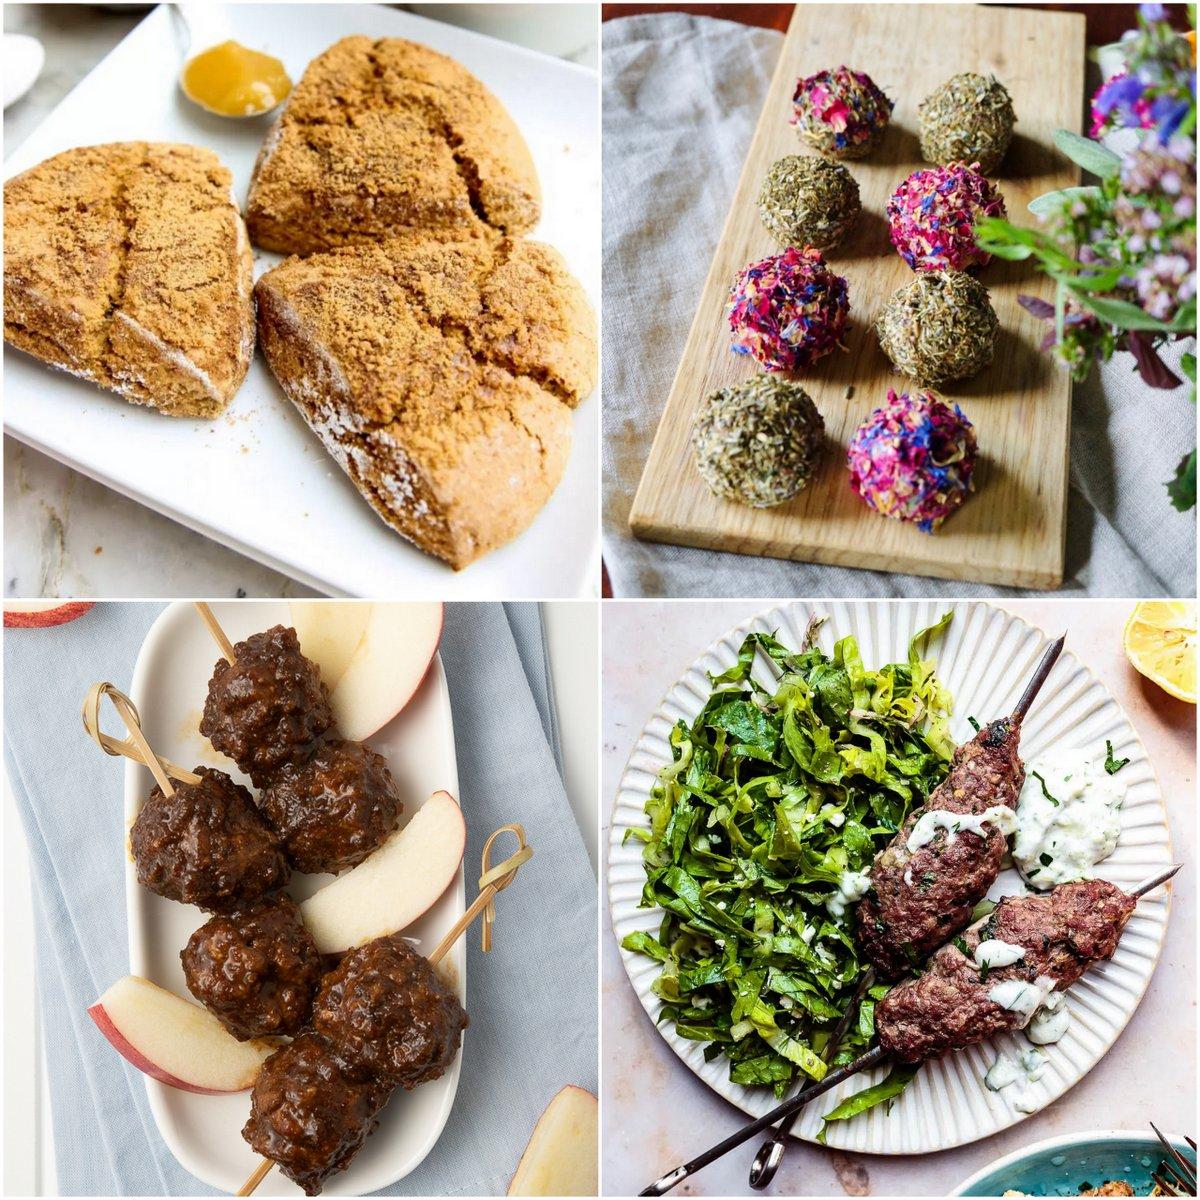 "Paleo AIP Recipe Roundtable #388 | Phoenix Helix - *Featured Recipes: Pumpkin Scones, Creamy Labneh ""Cheese"", Apple Pork BBQ Meatballs, and Baked Greek Kofta Kebabs with Tazatziki."